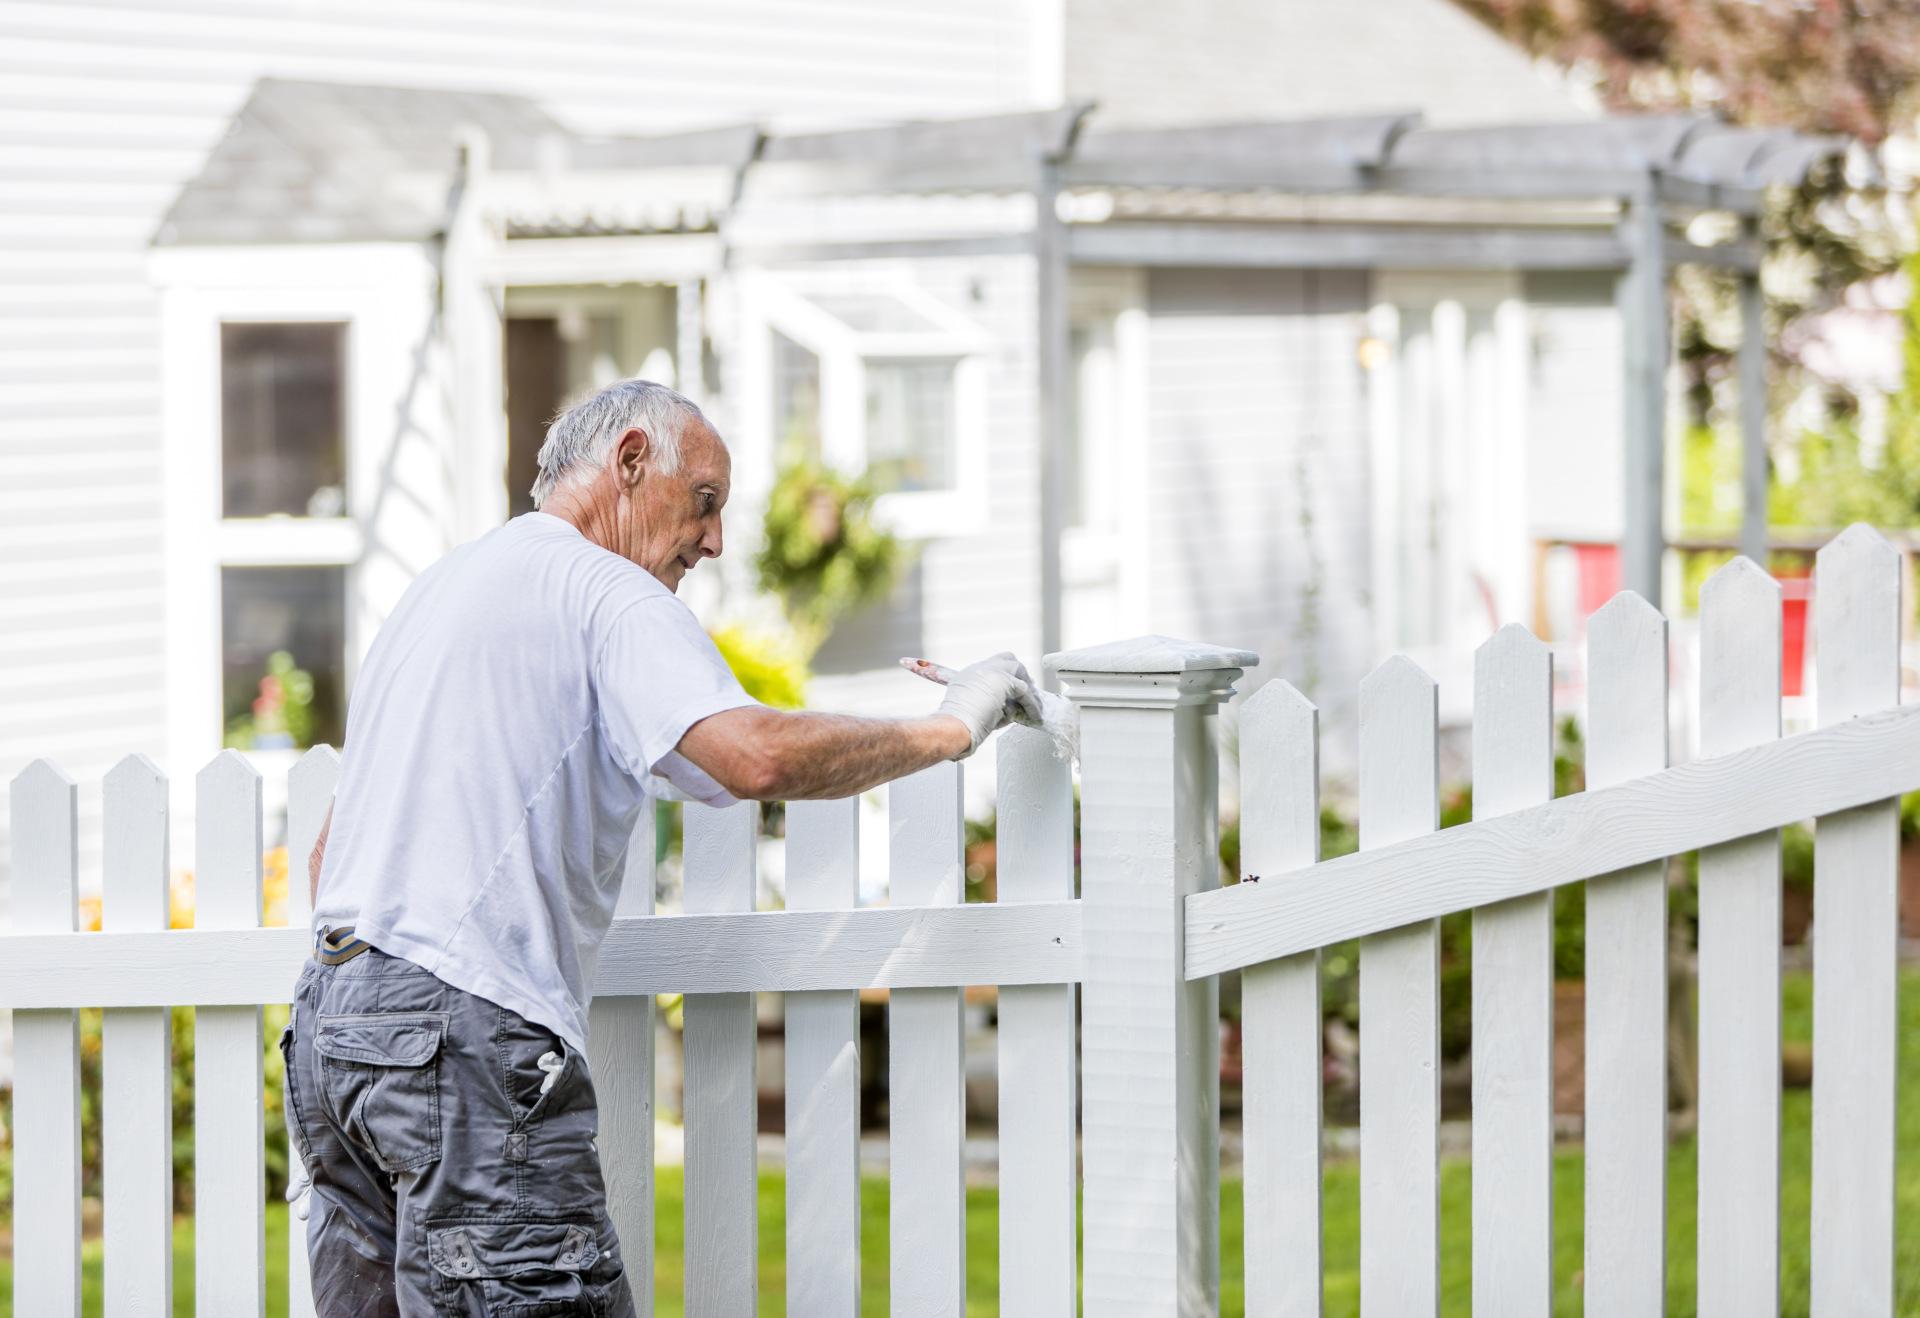 White man painting white fence